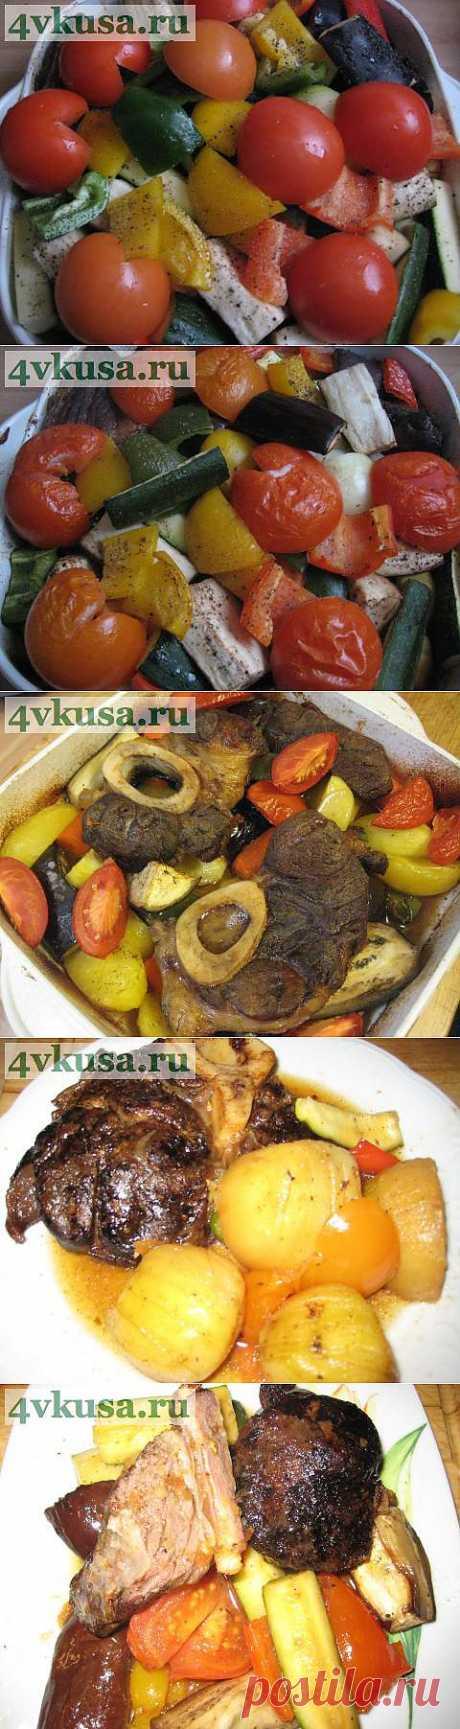 Мясо с овощами в духовке. | 4vkusa.ru